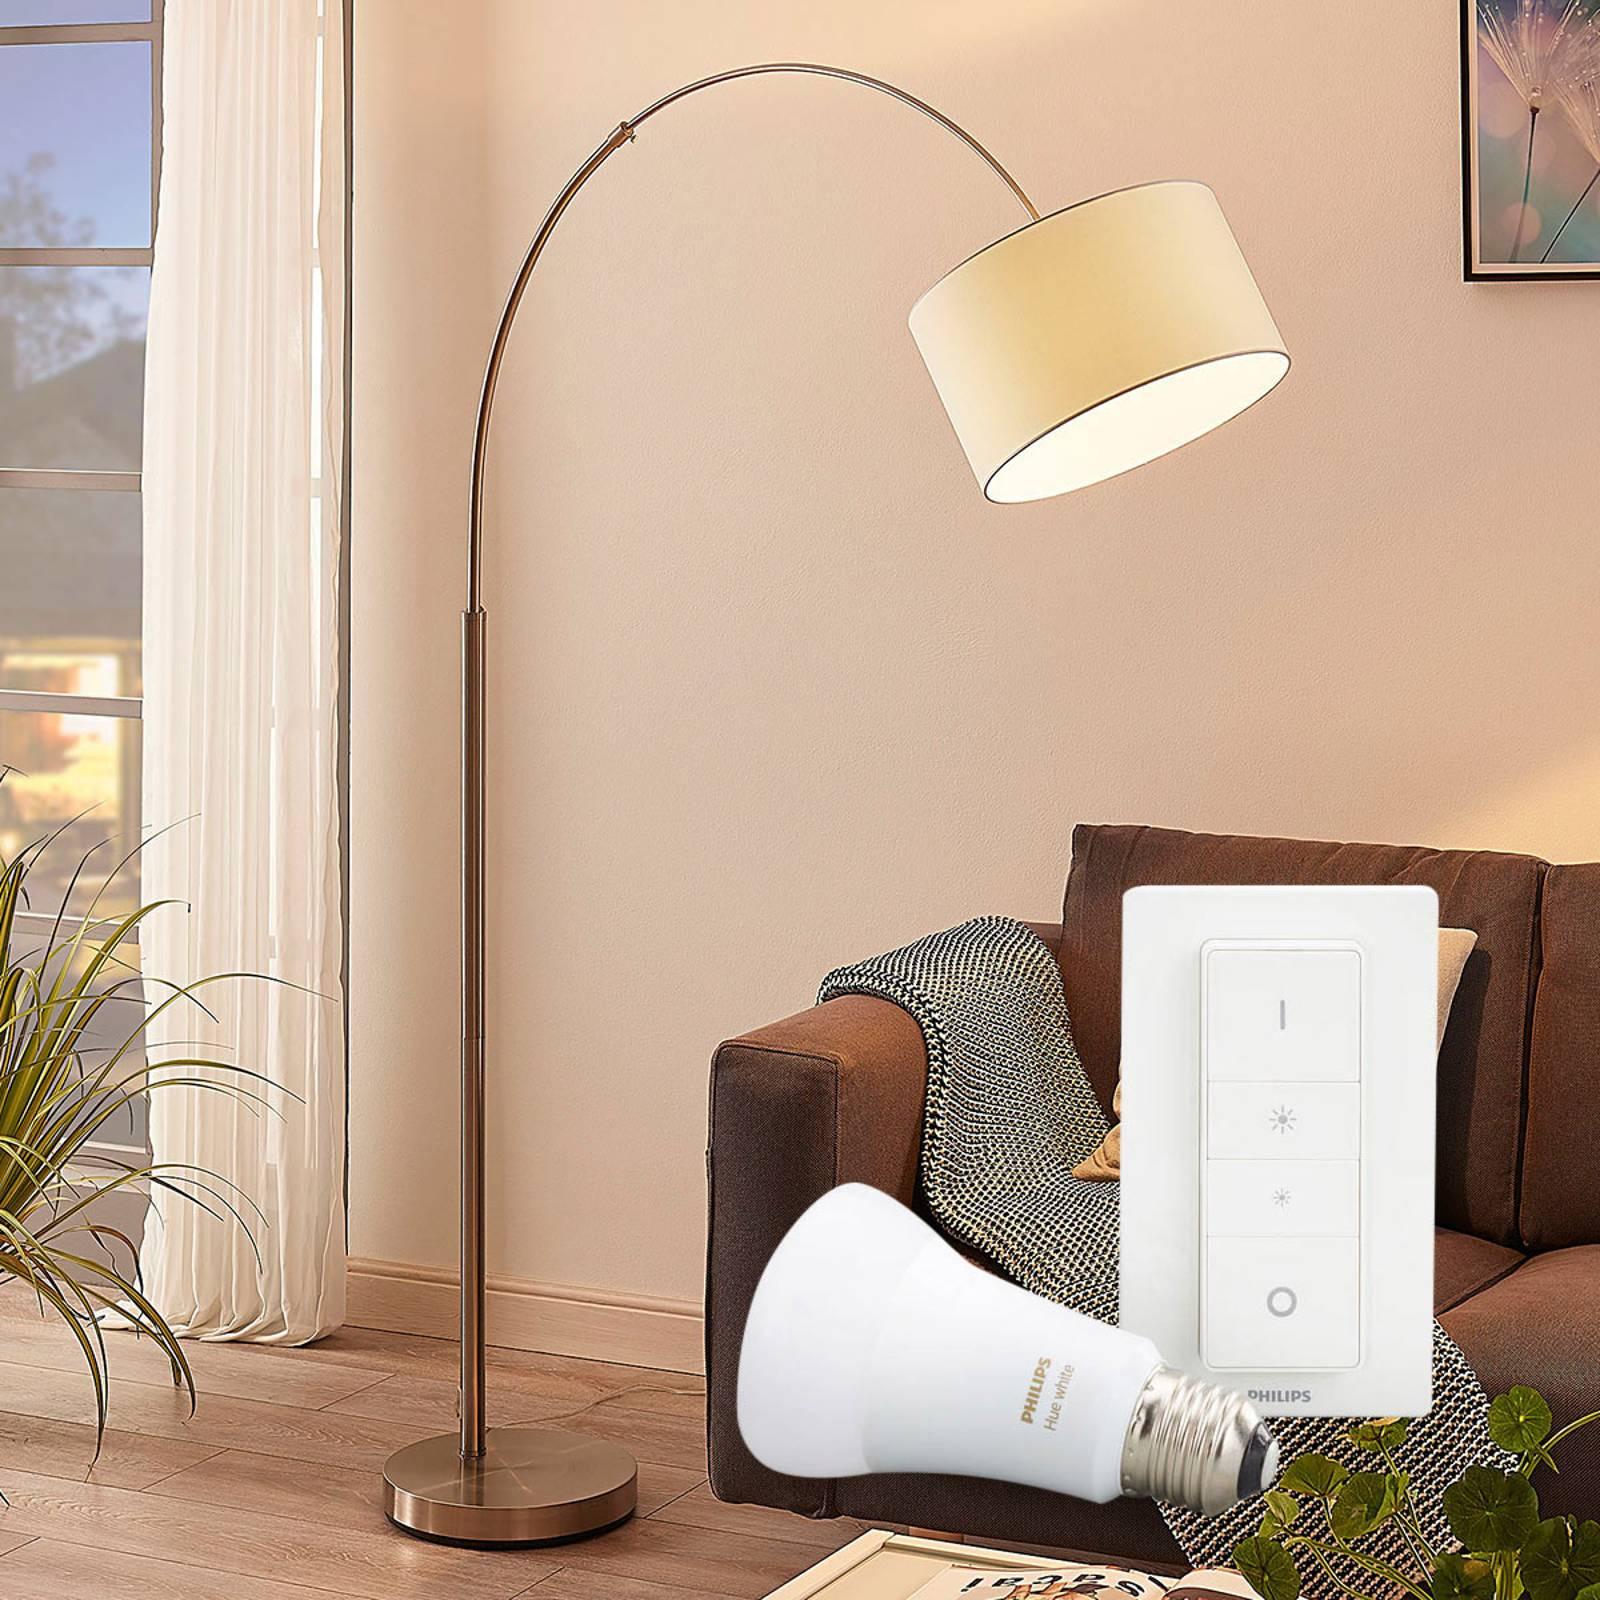 Vloerlamp Railyn Met Philips Hue E27 En Dimmer Lampen24 Be